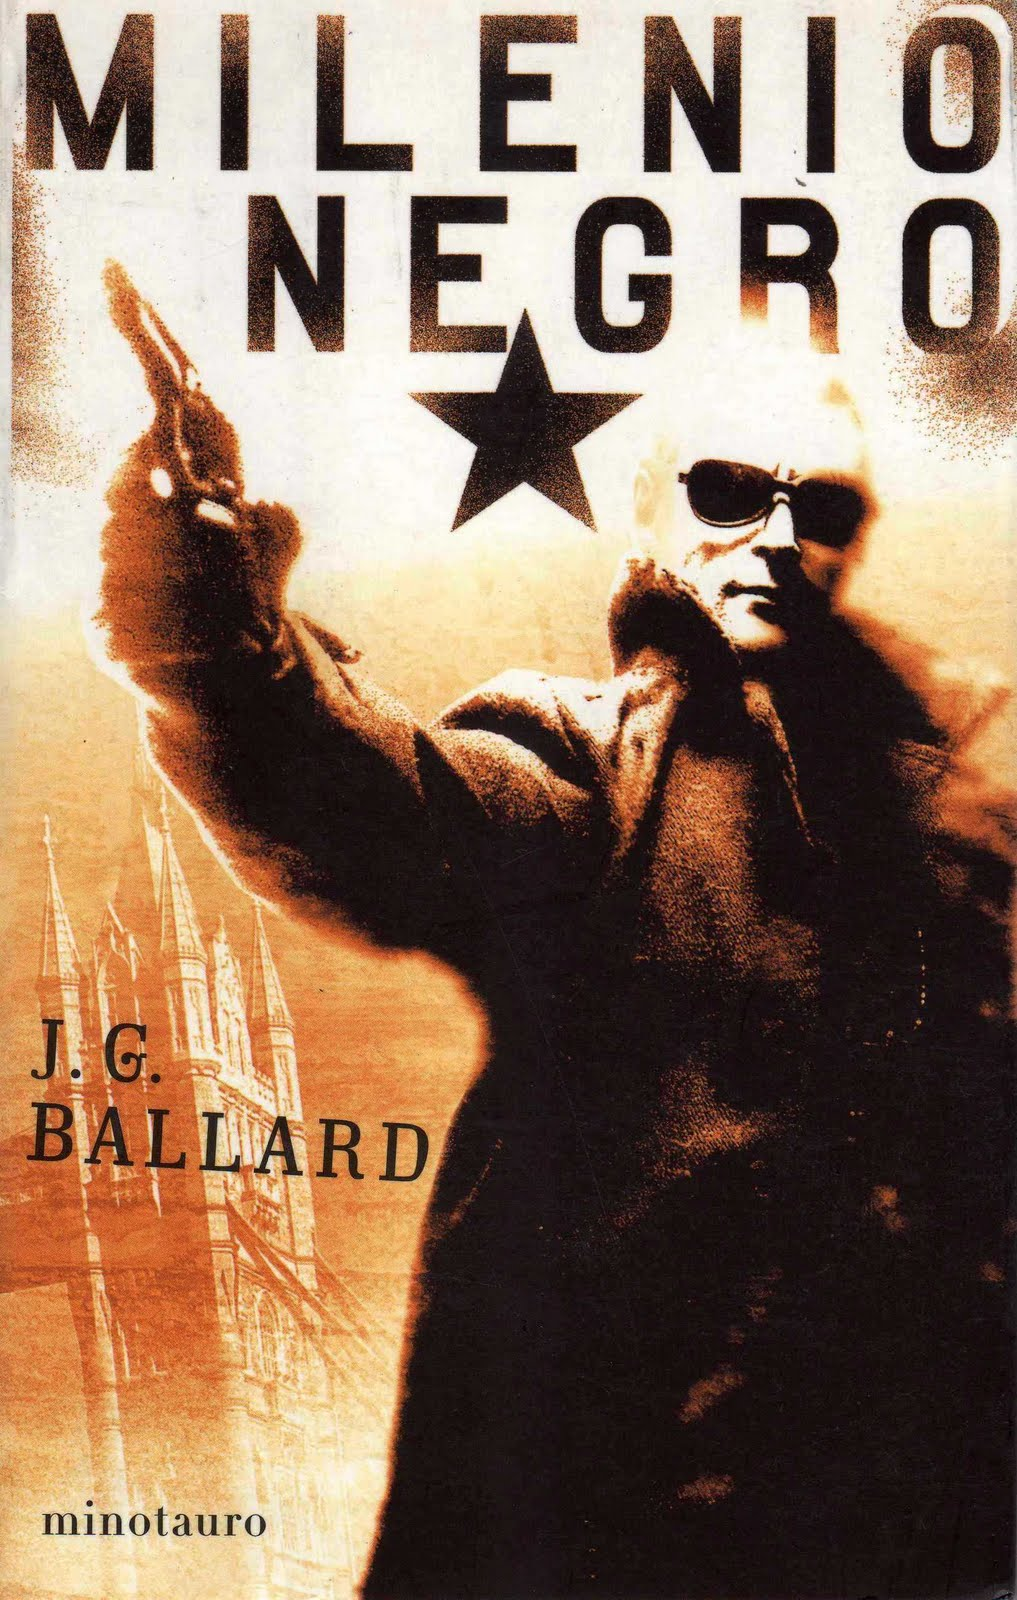 Milenio negro, J. G Ballard